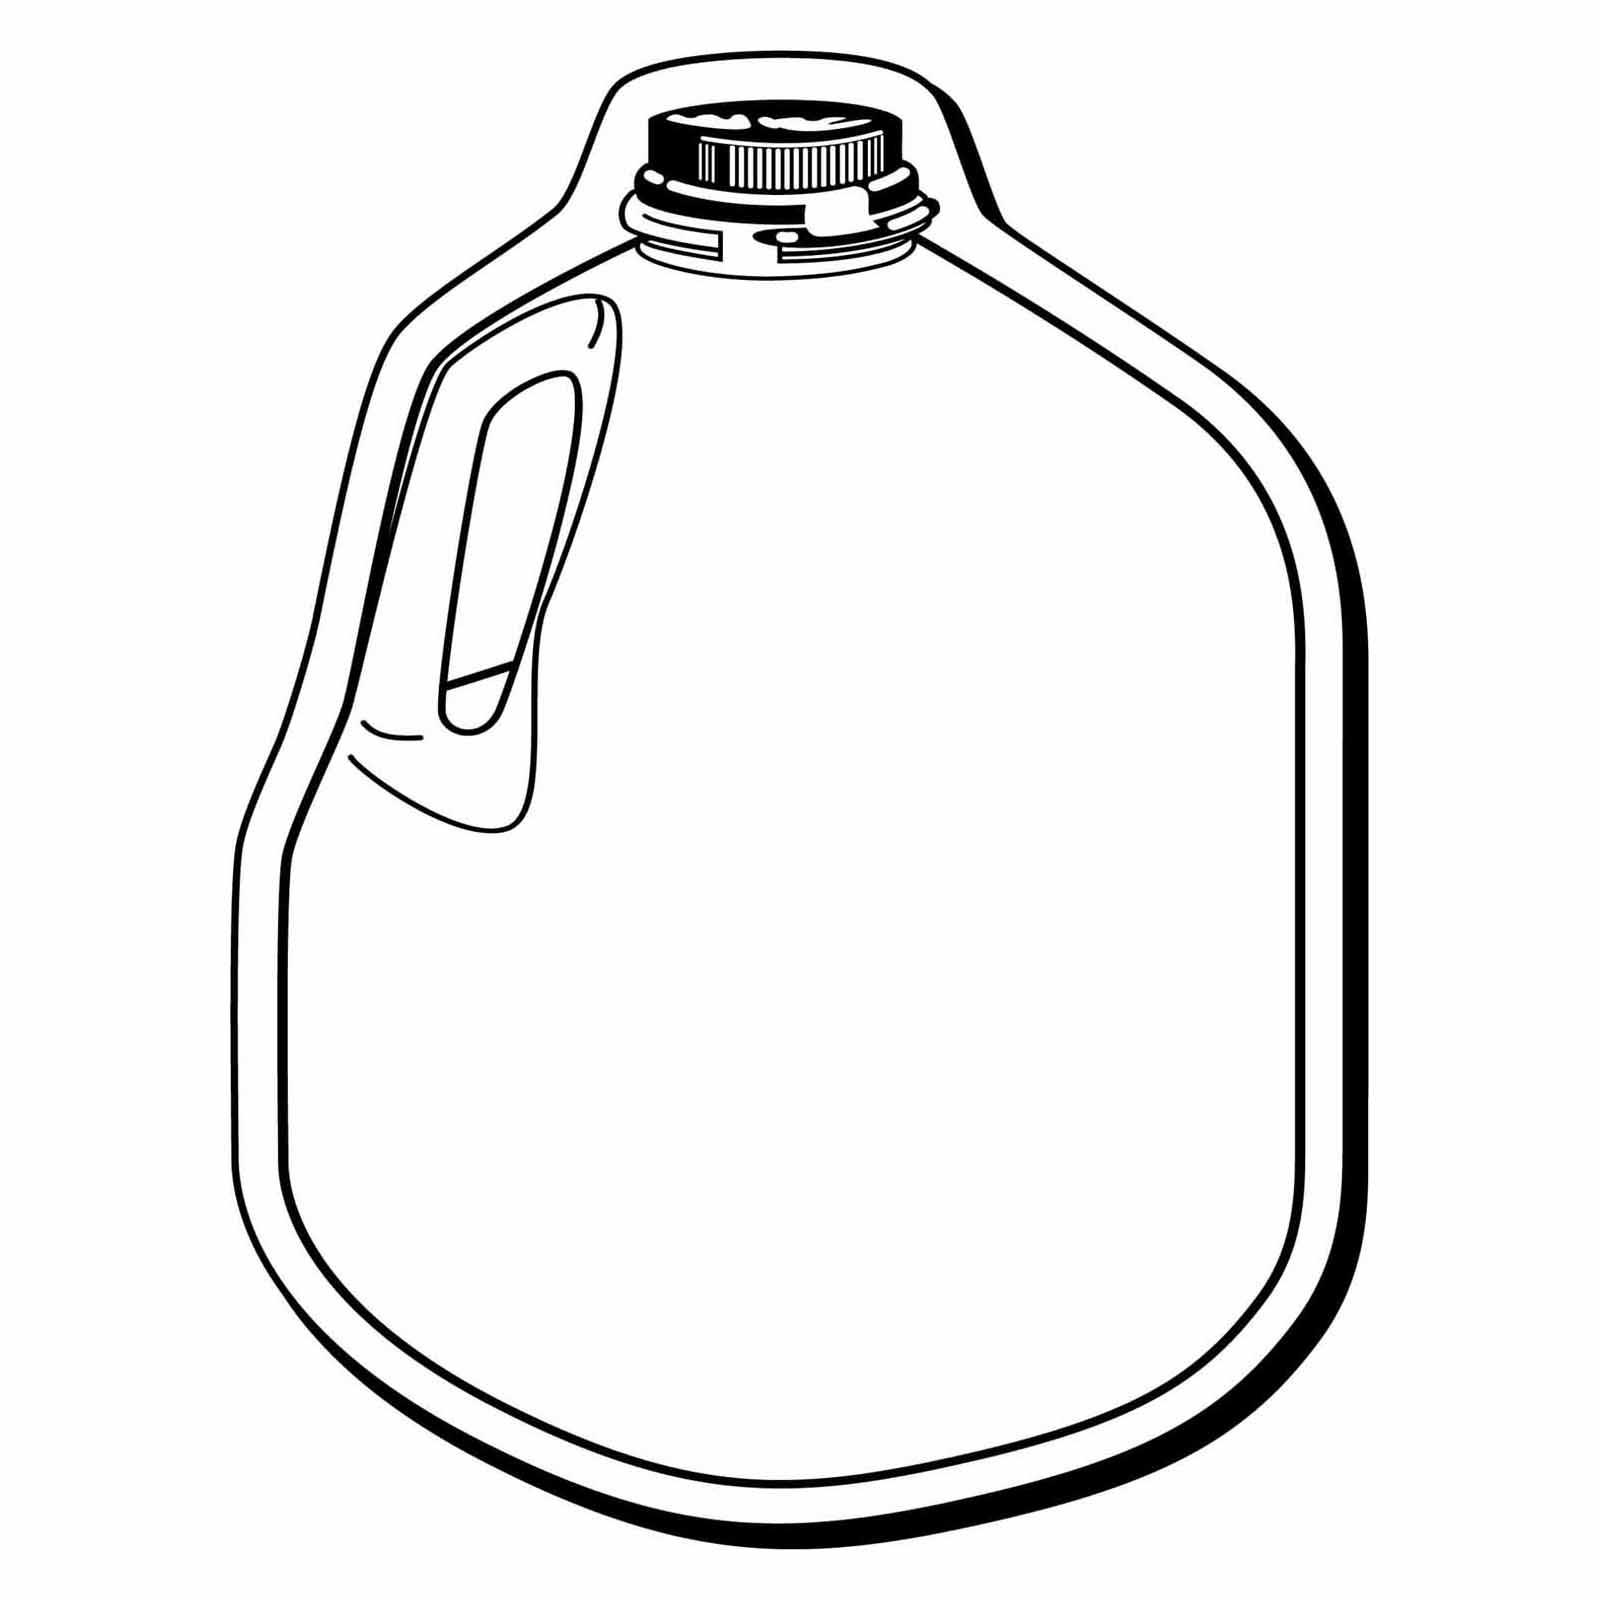 Free Cliparts Gallon Jug, Download Free Clip Art, Free Clip Art on.